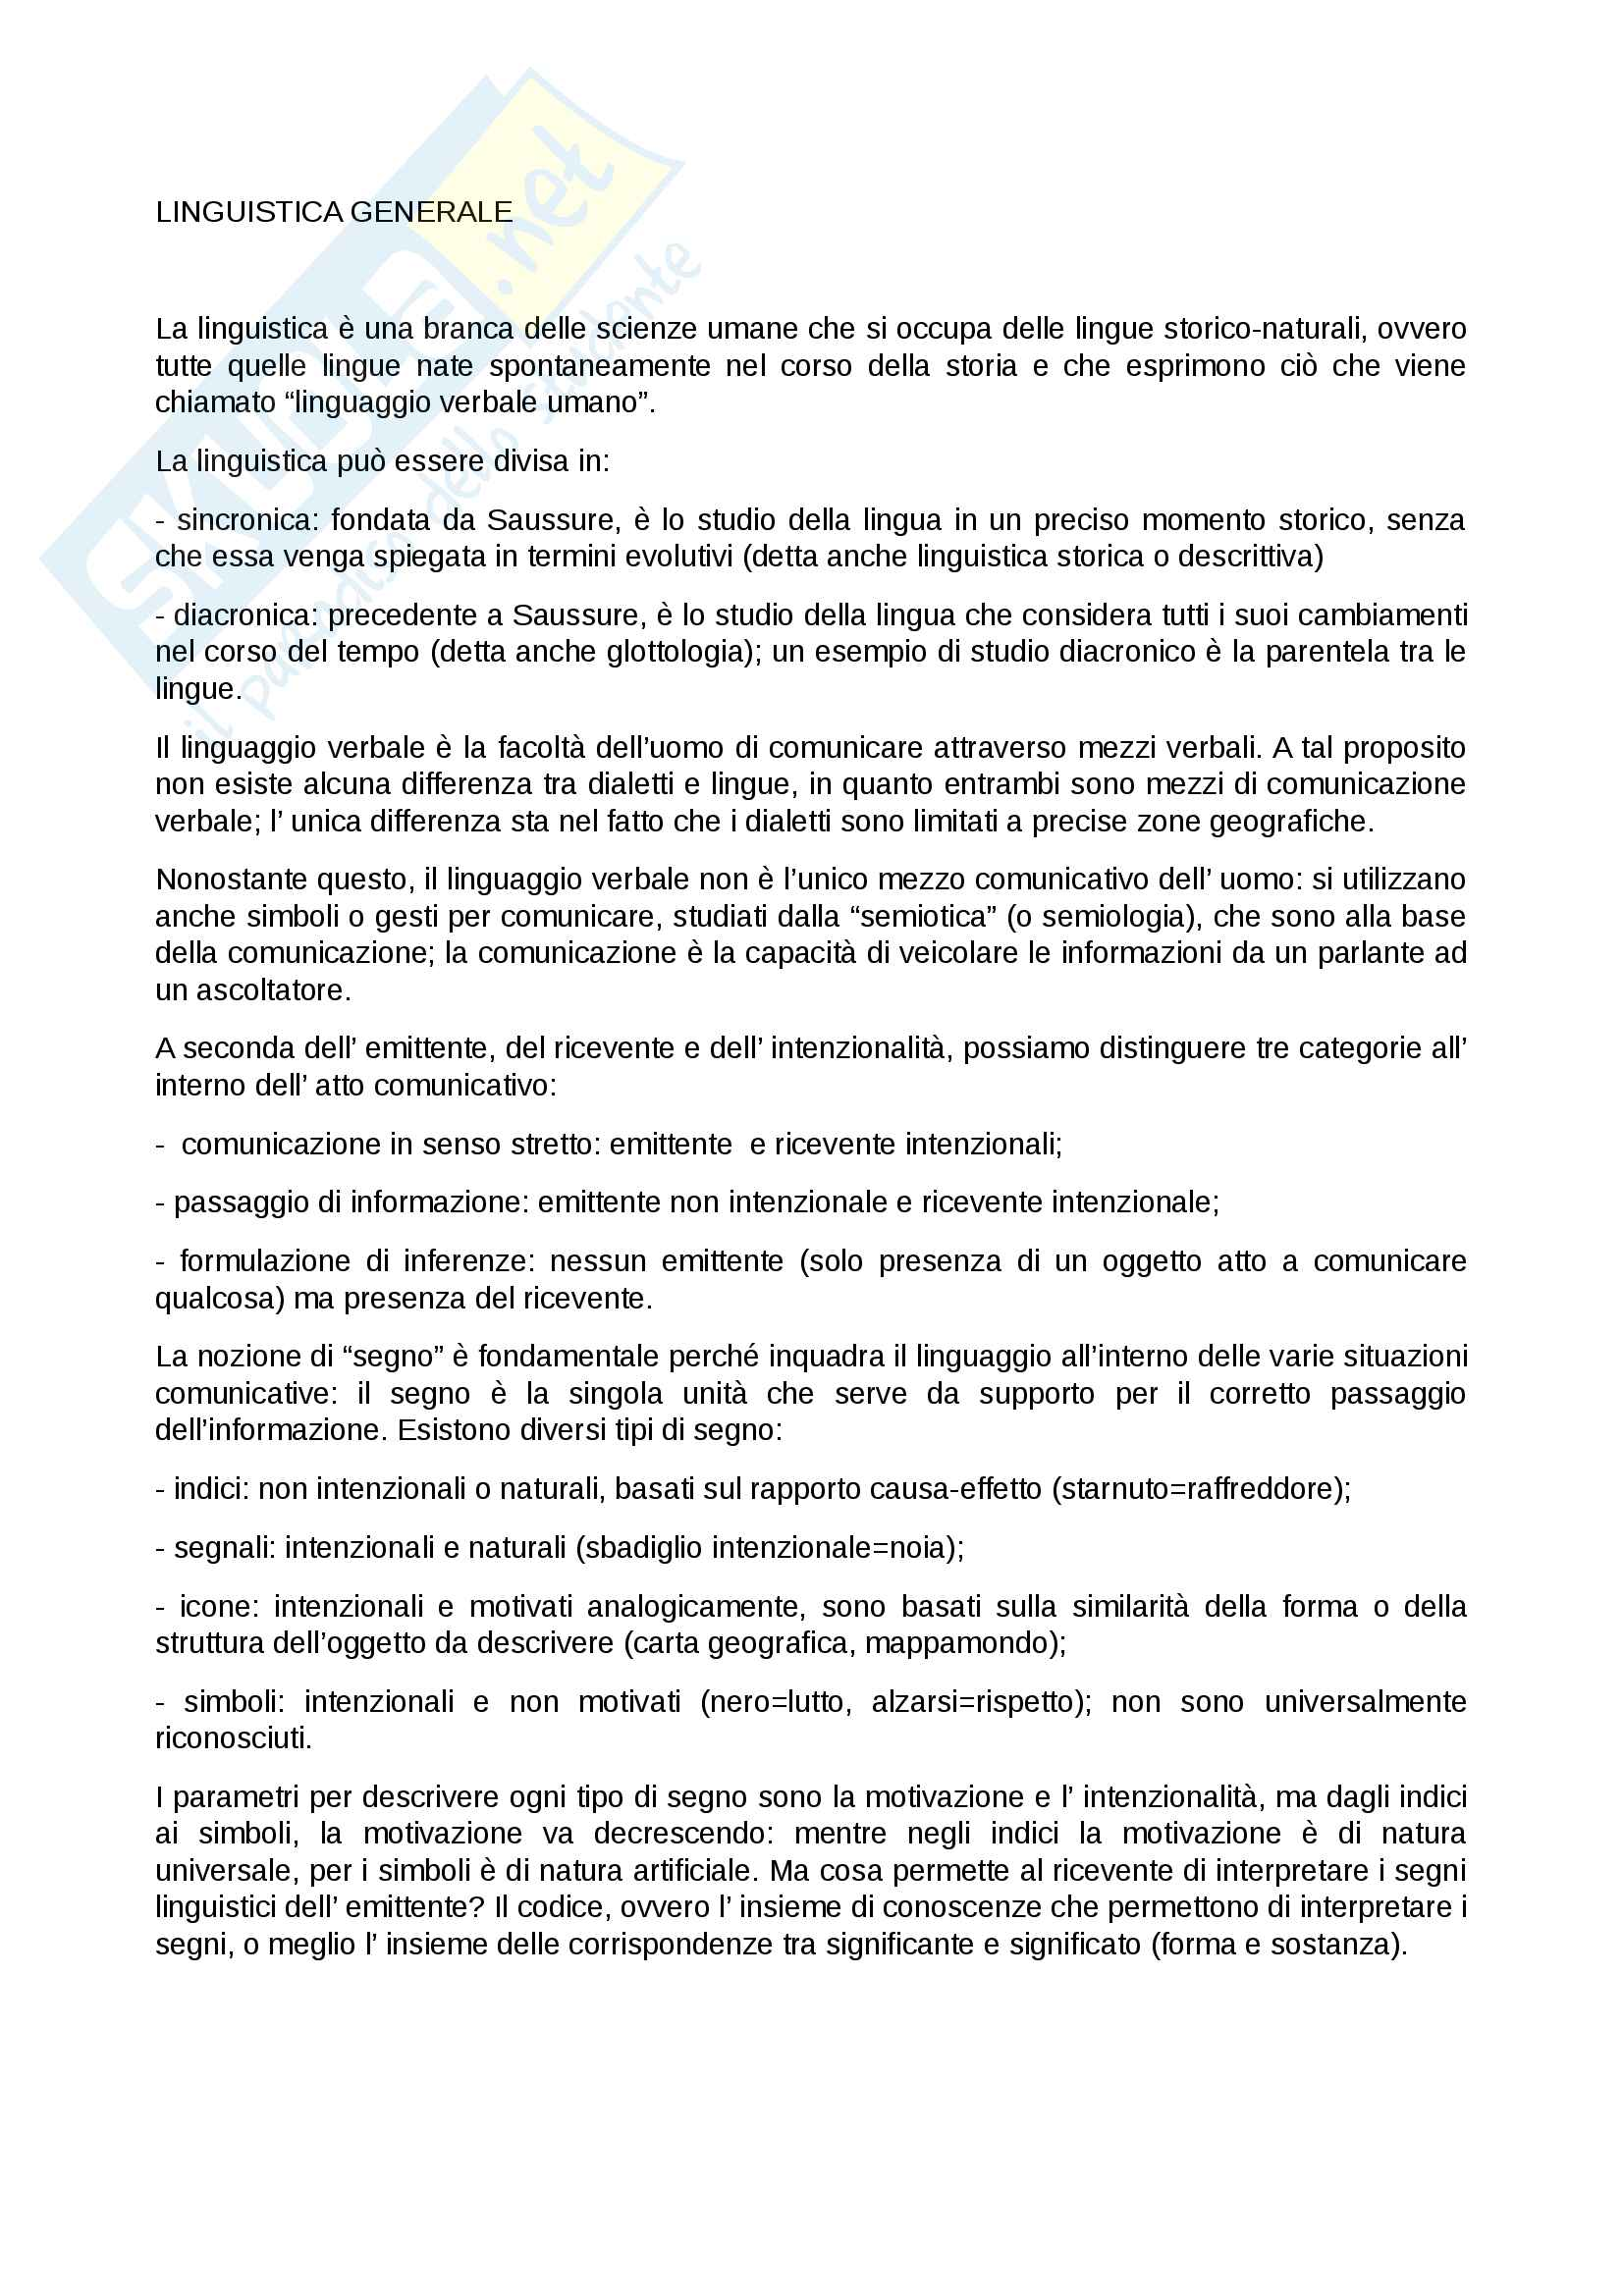 Linguistica generale: I modulo